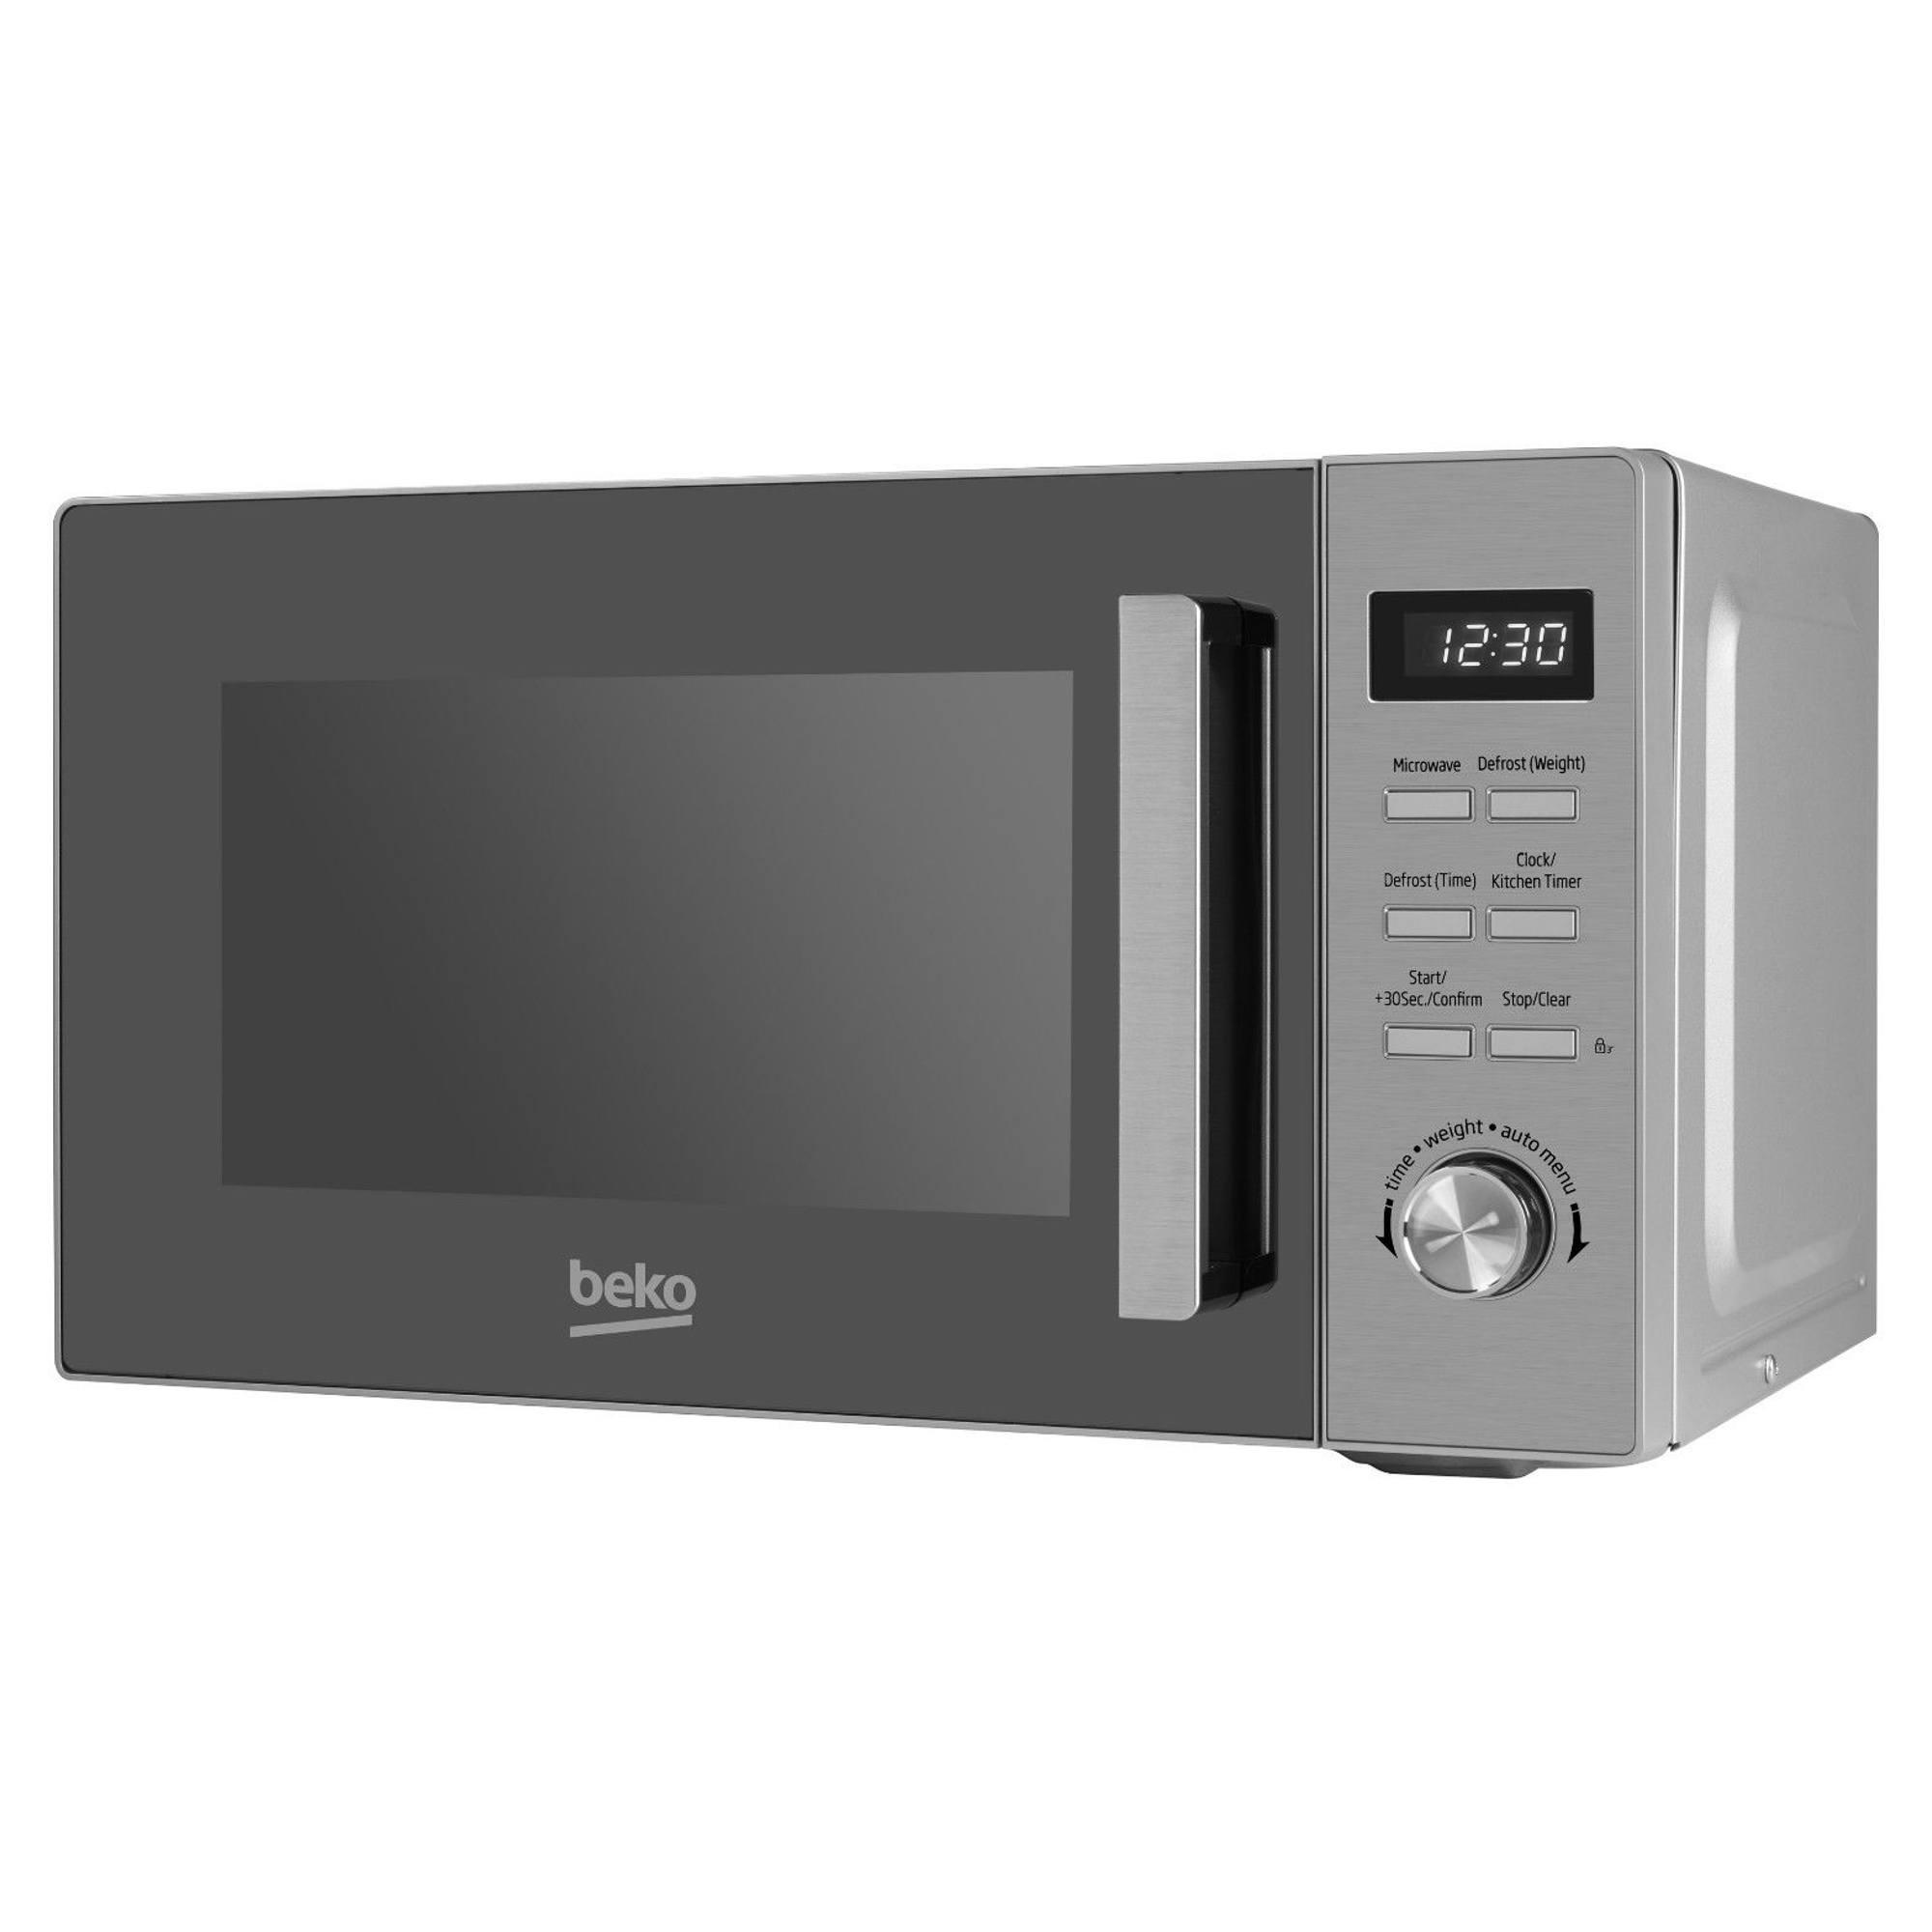 sata drive reg product hdd xcellon toaster photo hard c video dock h b